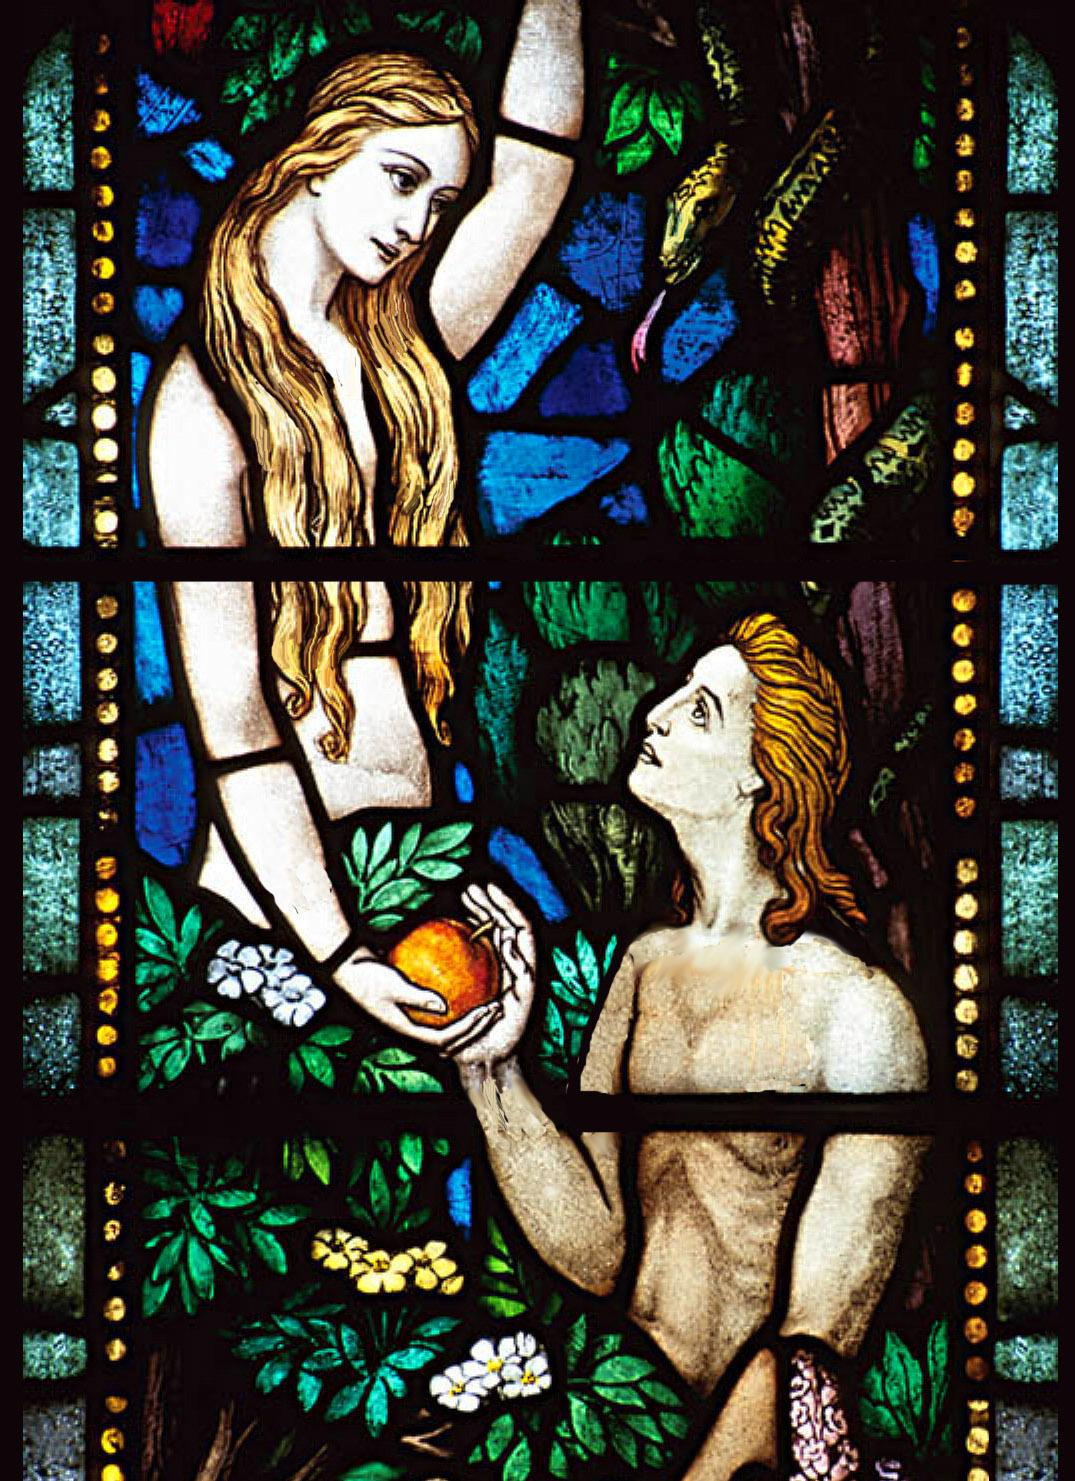 http://1.bp.blogspot.com/_QNGv2PaVQ9w/S7sPr-l8PfI/AAAAAAAAAMQ/y1HLb9_r-ng/s1600/Adam+and+Eve.jpg